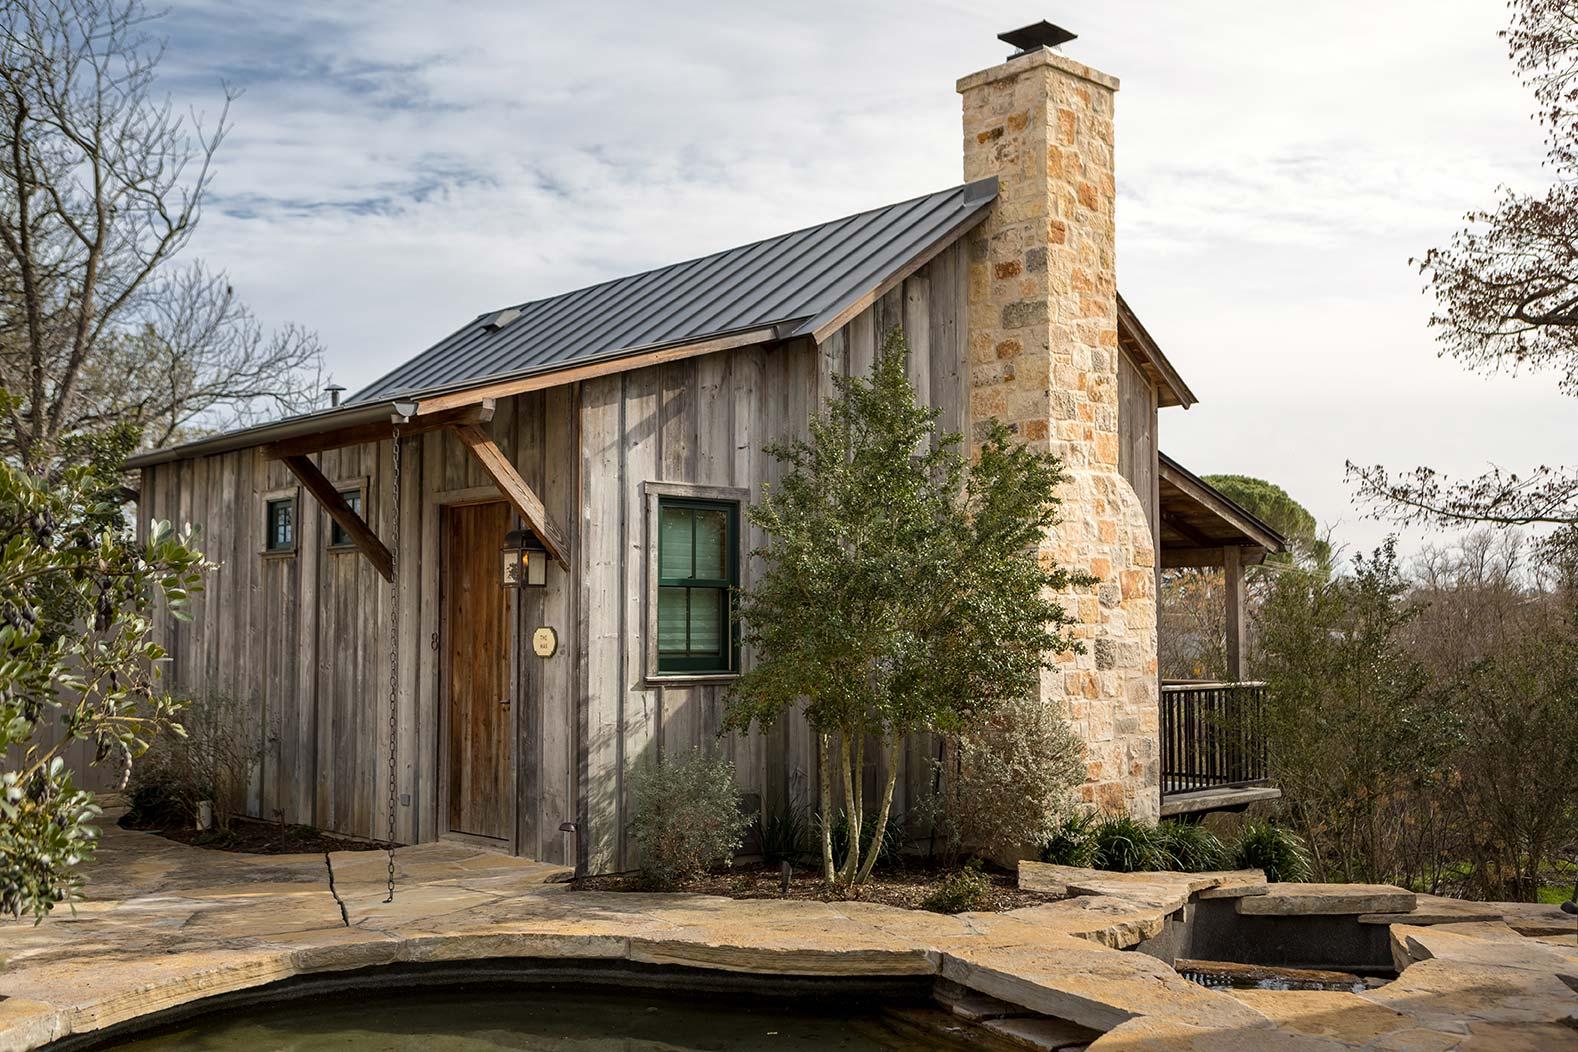 blacksmith-quarters-fredericksburg-realty-texas-commercial-real-estate.jpg